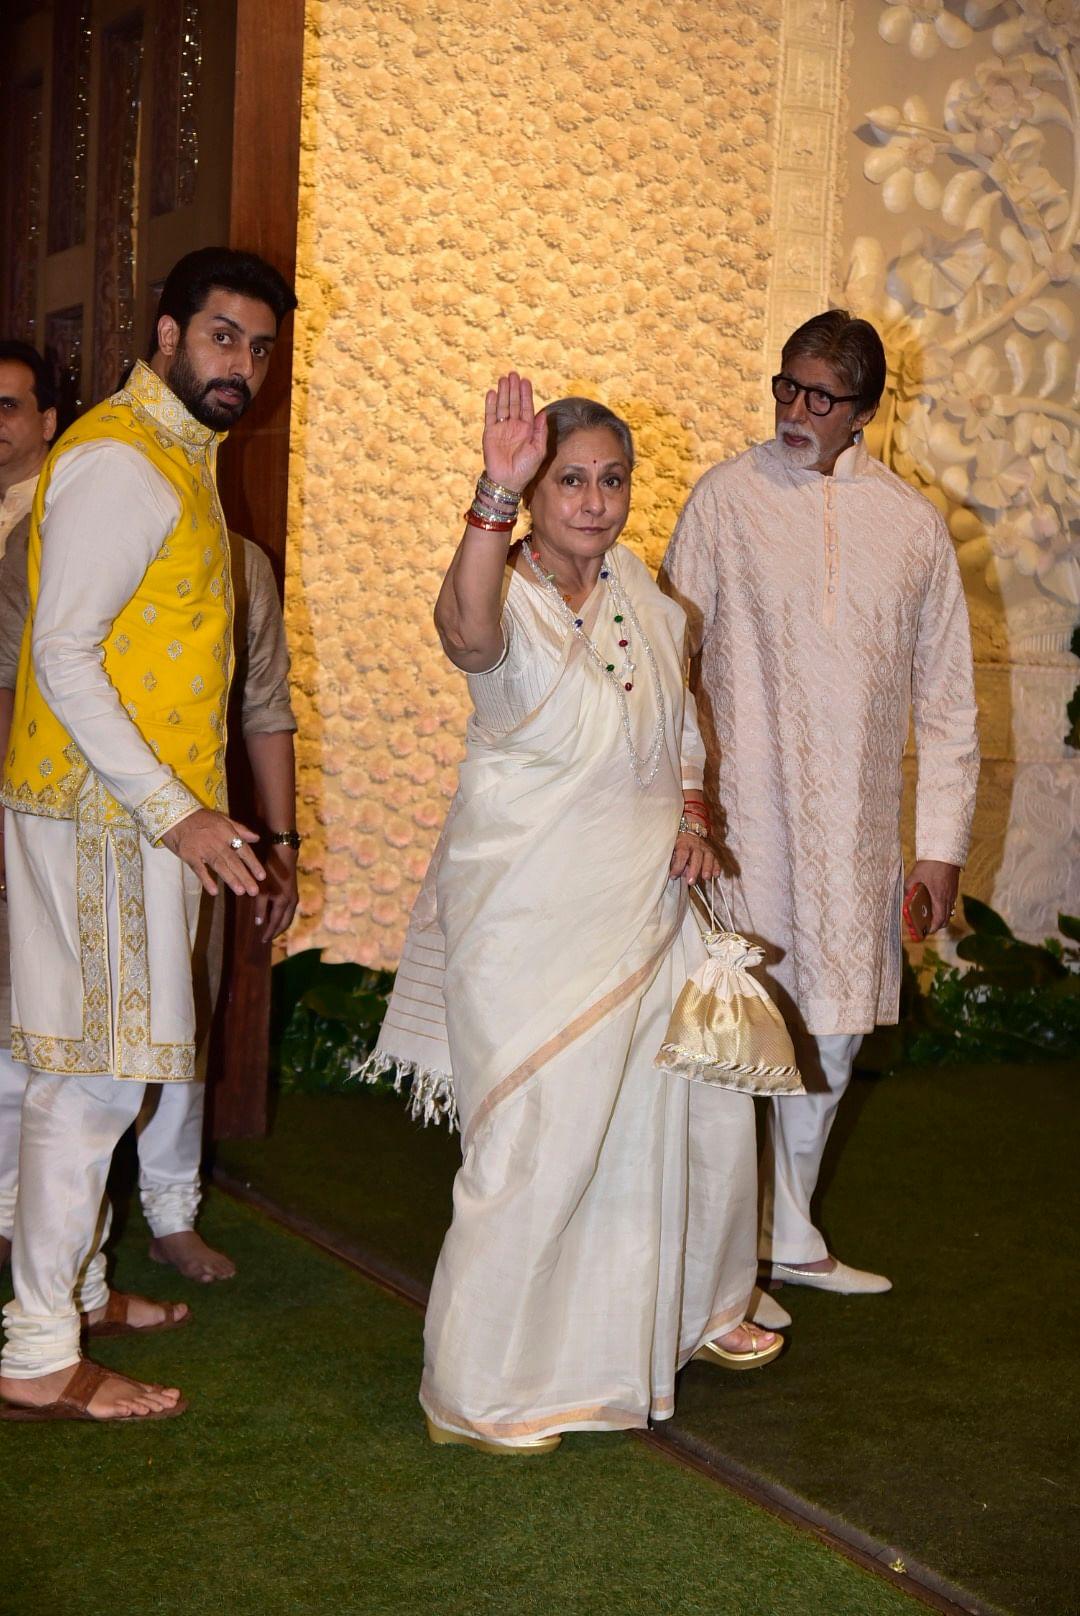 Amitabh Bachchan, Jaya Bachchan and Abhishek at Antilia Ganpati celebrations